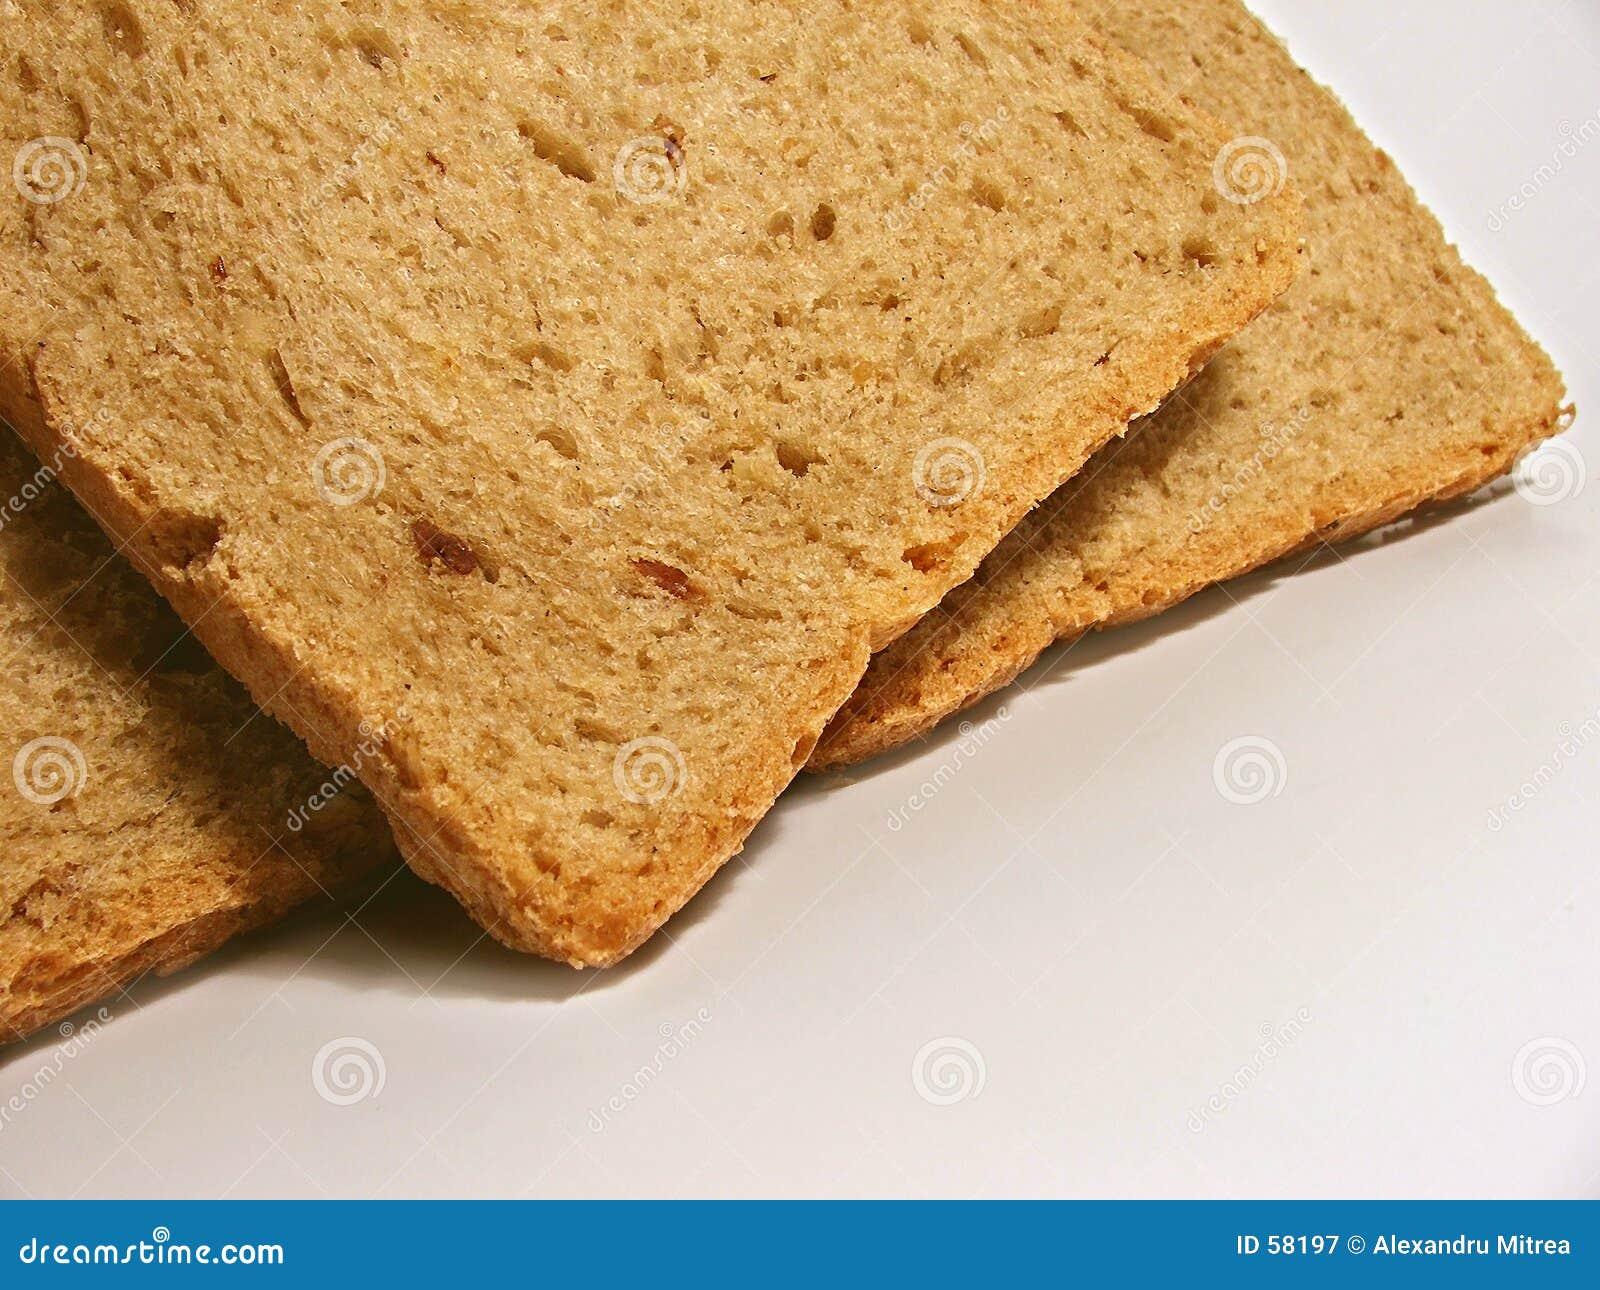 Download ψωμί στοκ εικόνα. εικόνα από υγεία, δημητριακά, σκιές, τρόφιμα - 58197